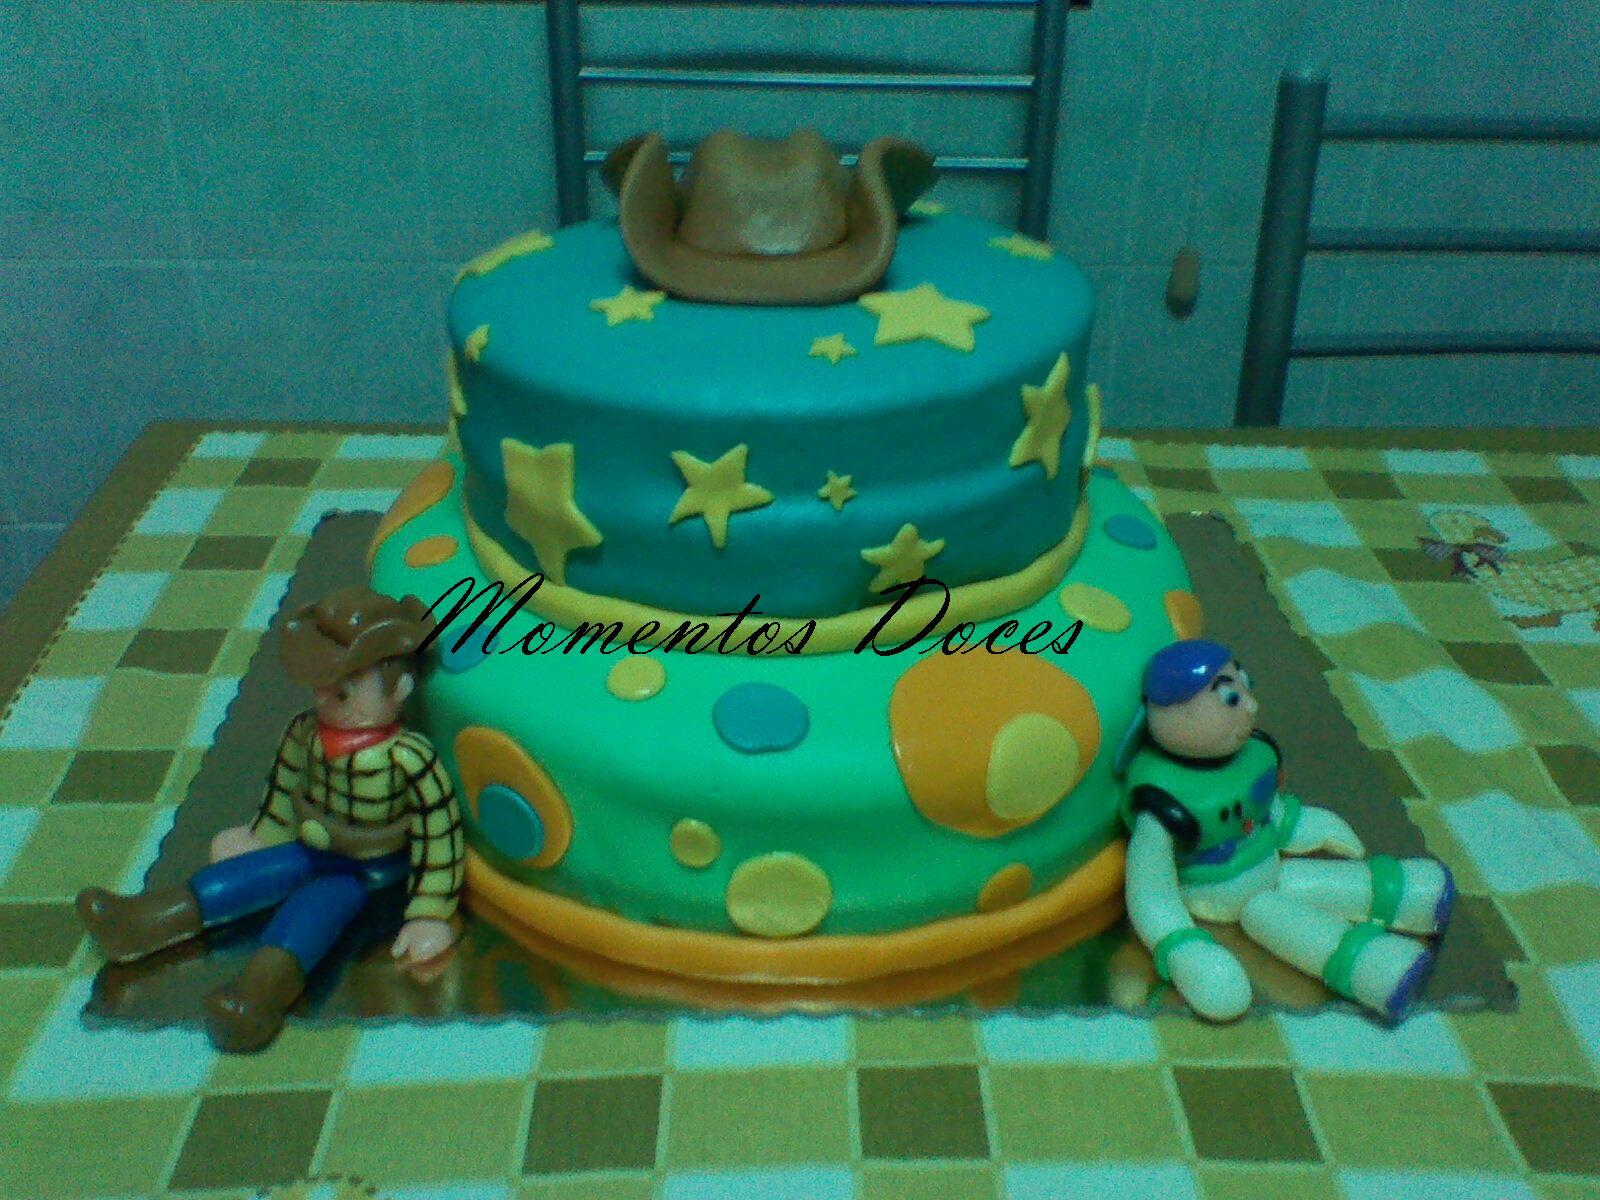 Risota Cakes